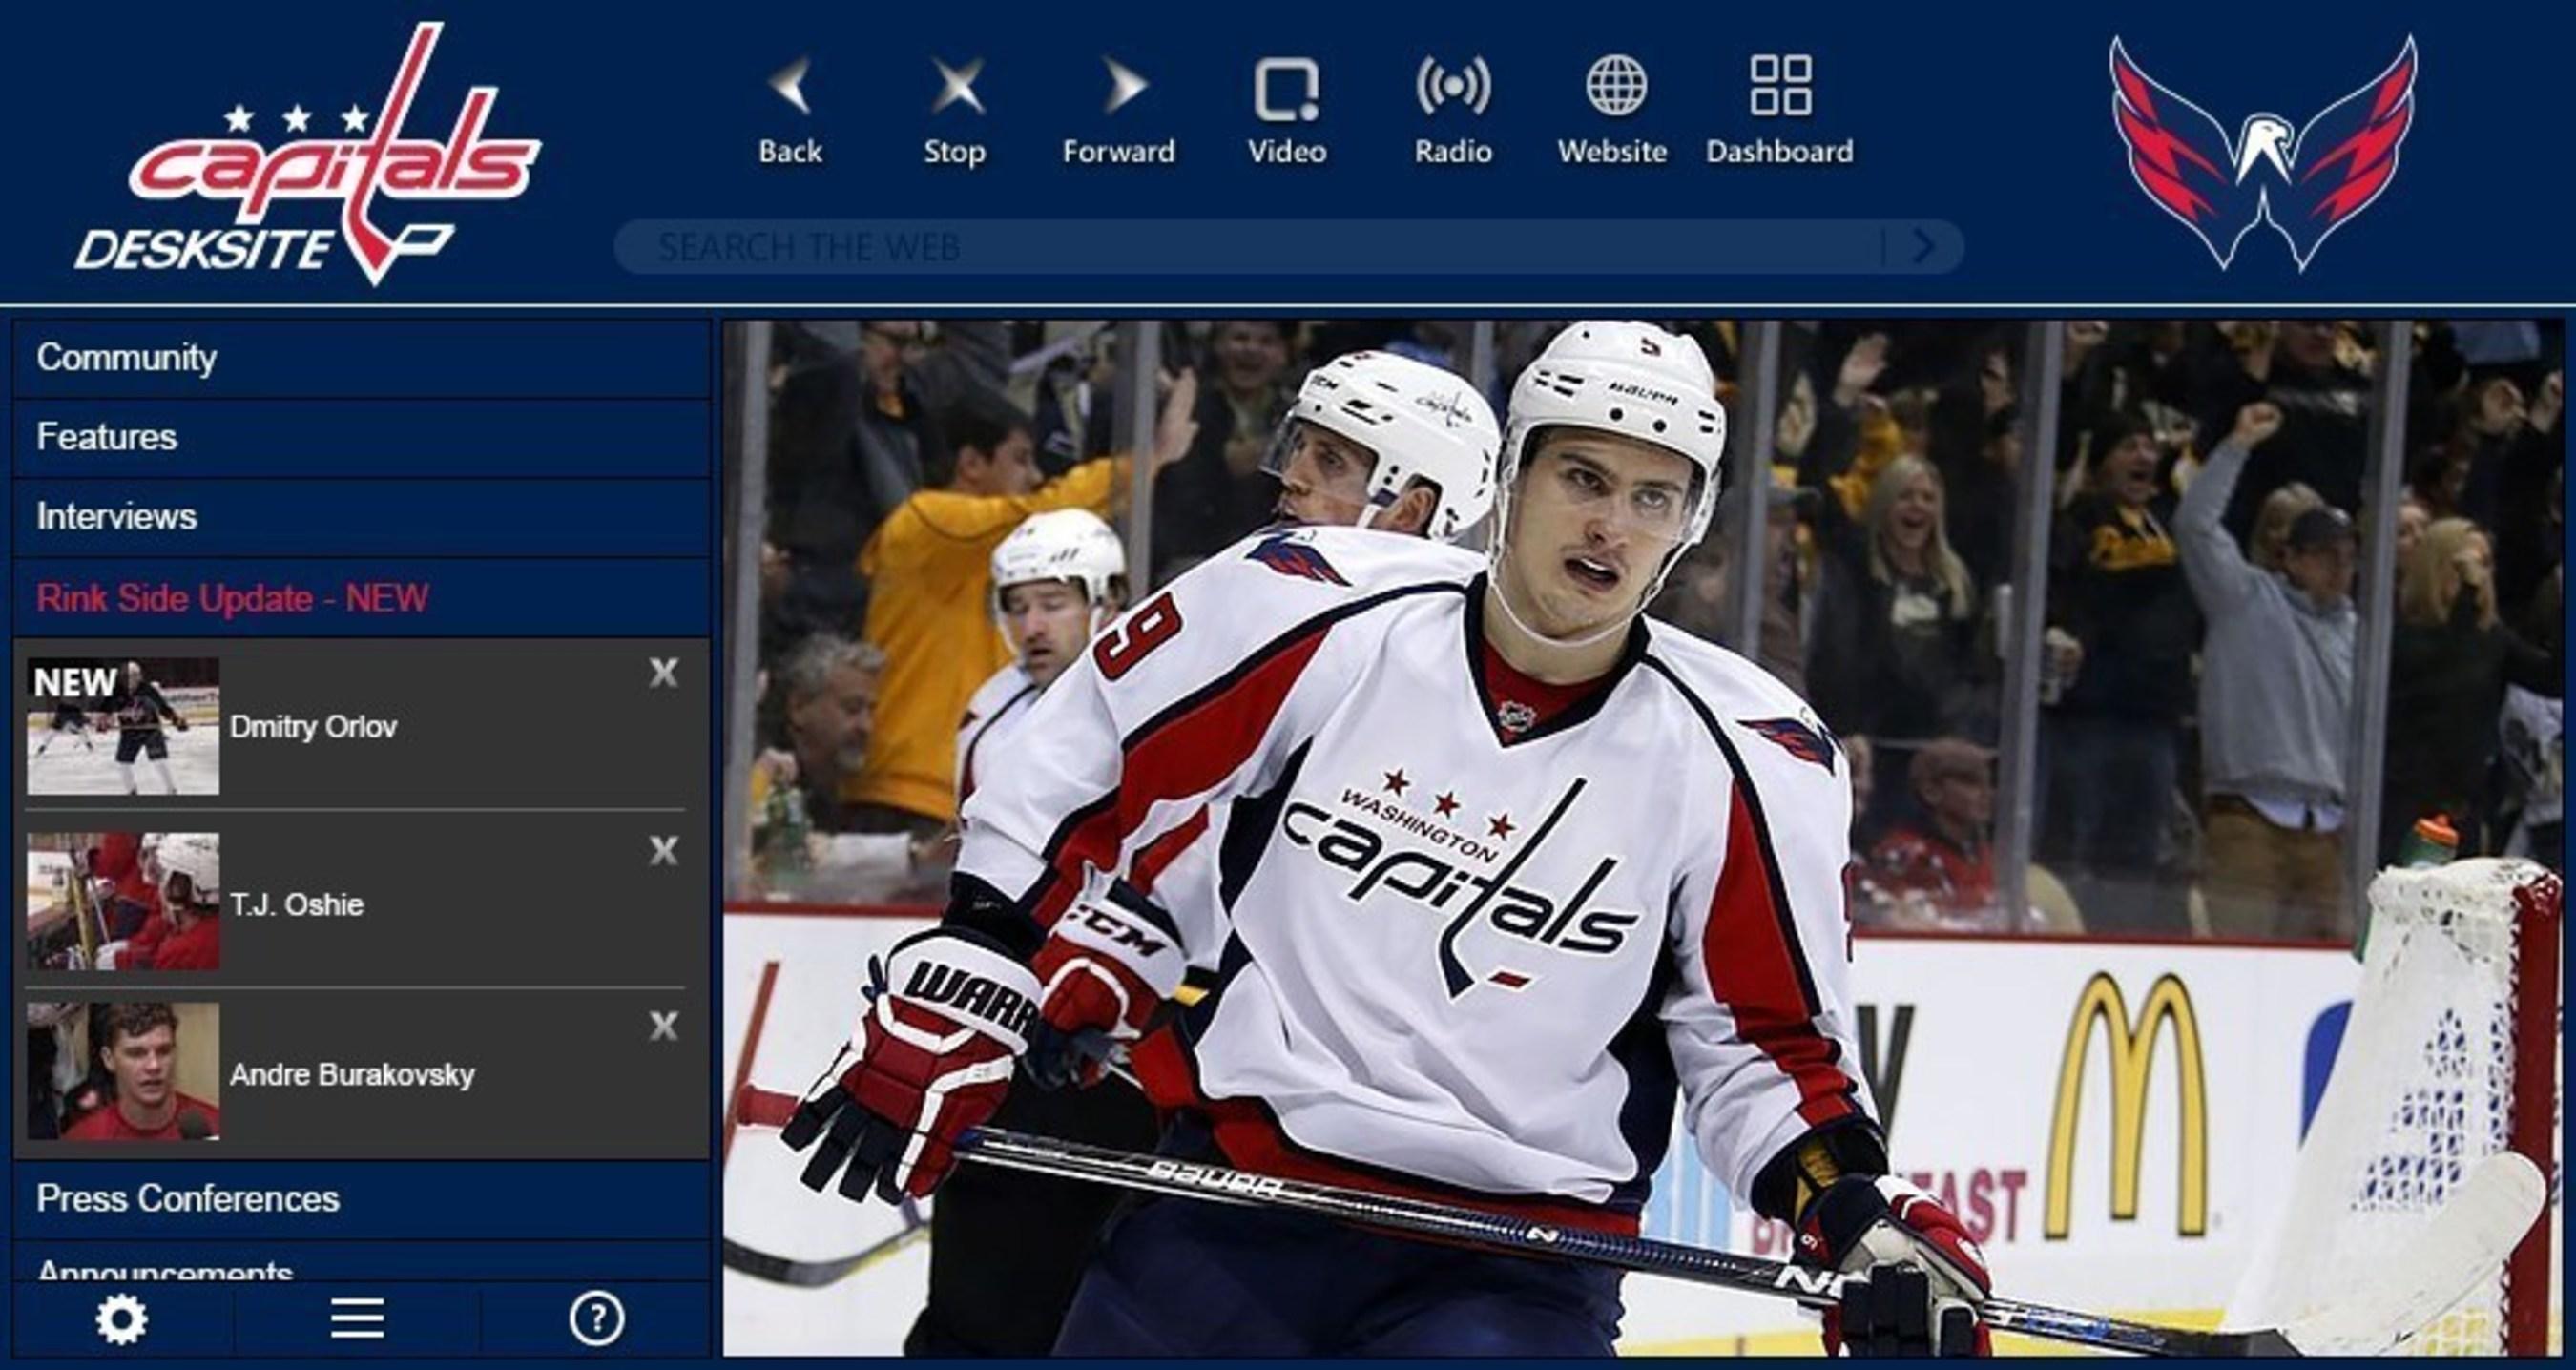 Washington Capitals launch new video app with Capitals DeskSite